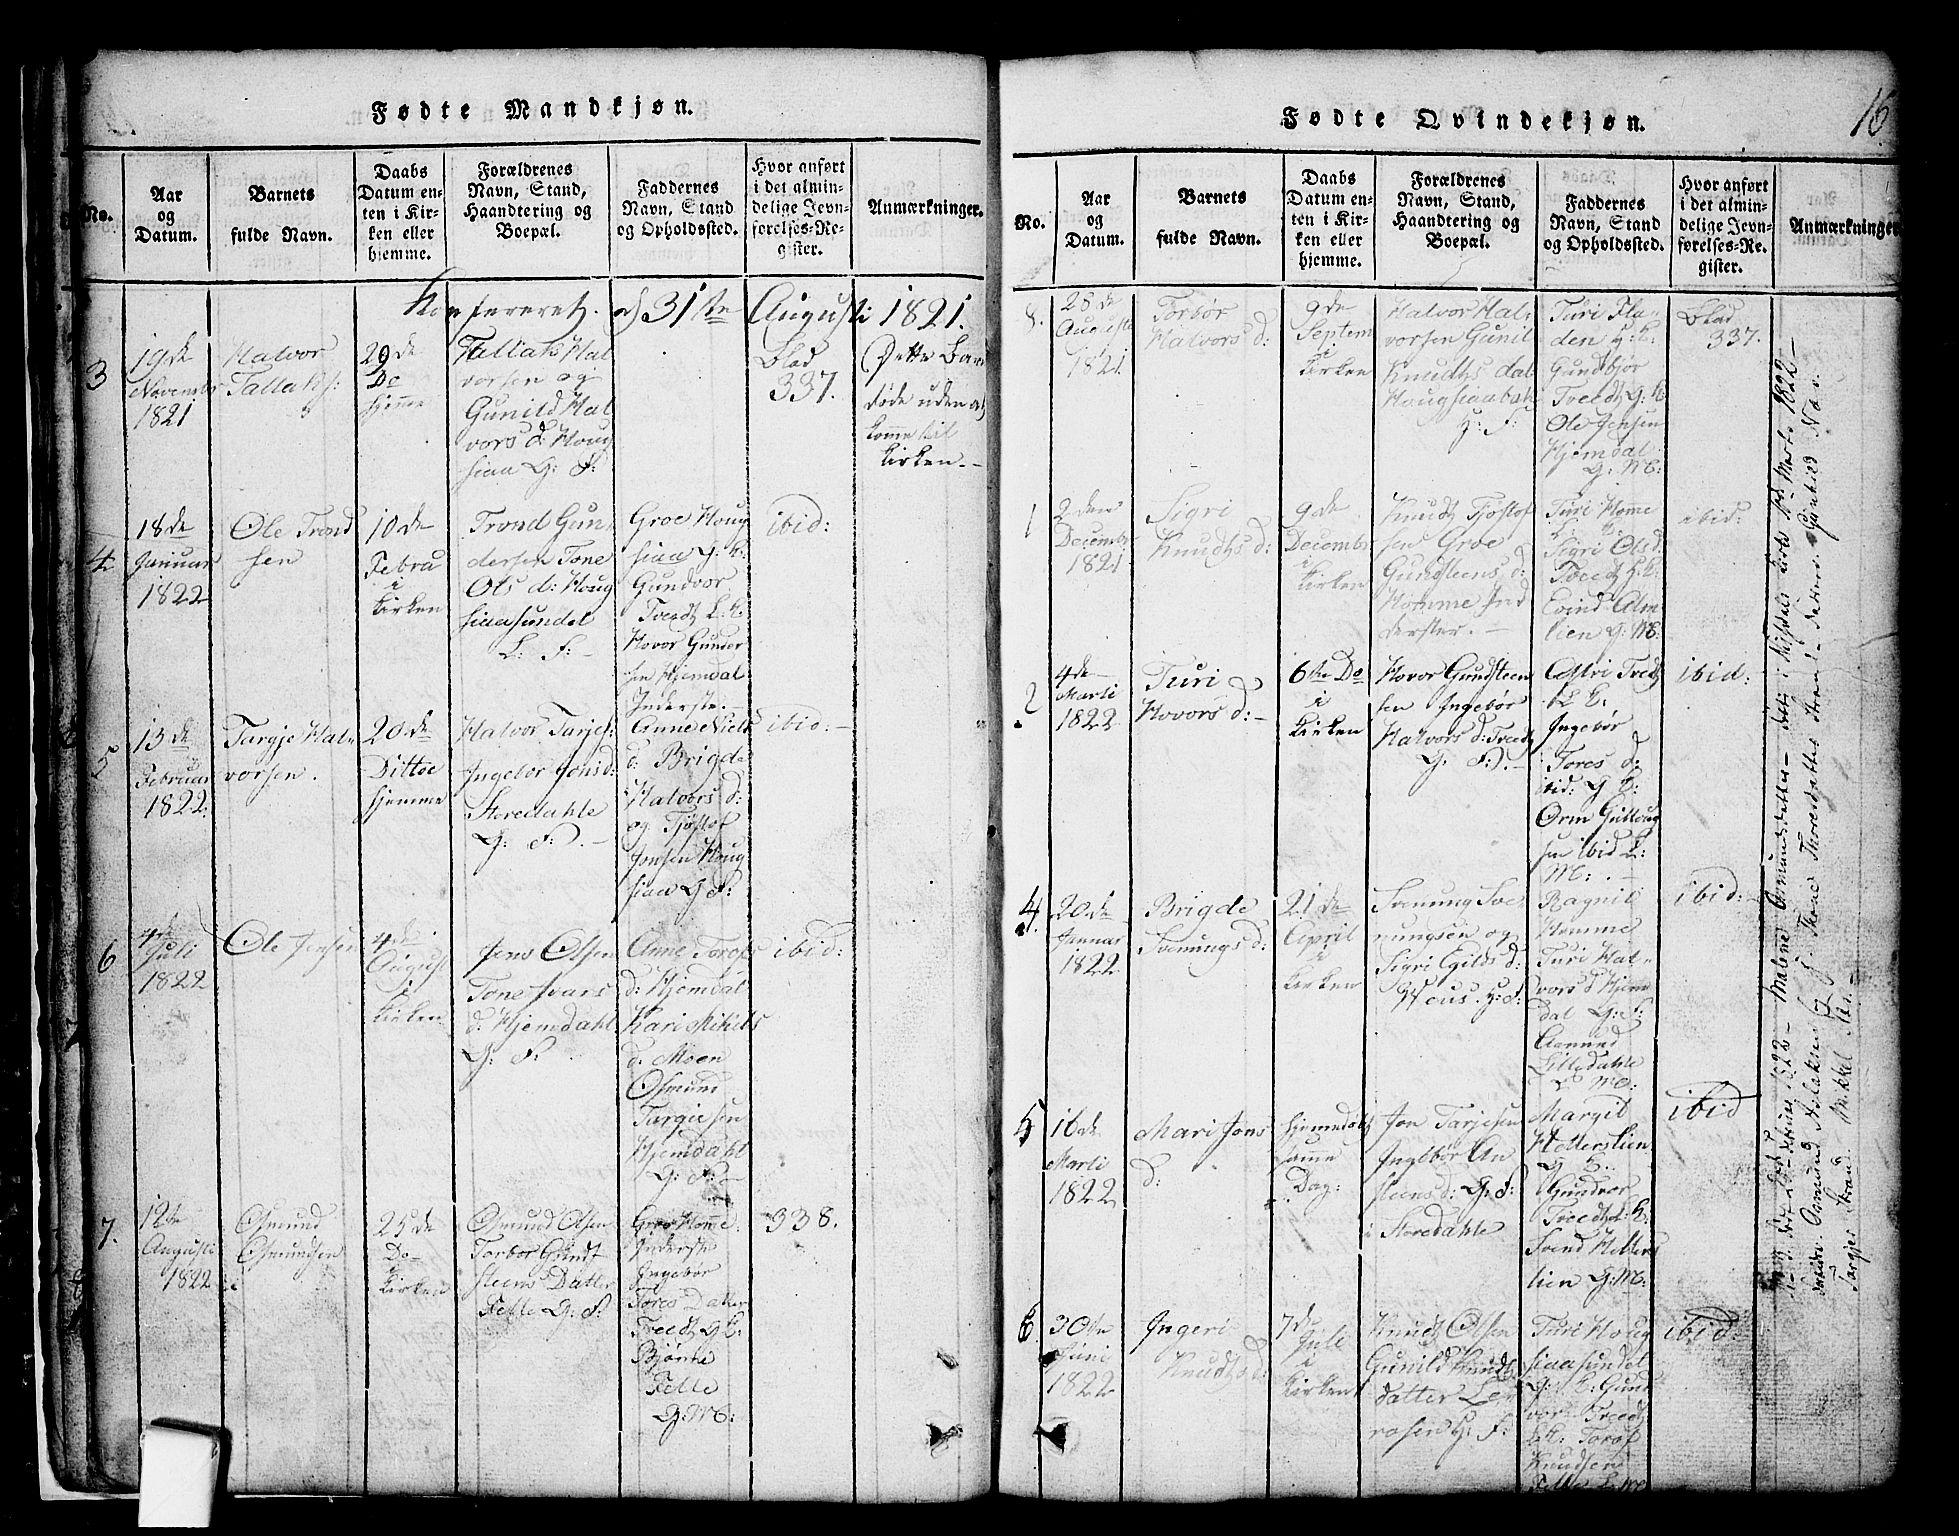 SAKO, Nissedal kirkebøker, G/Gb/L0001: Klokkerbok nr. II 1, 1814-1862, s. 16